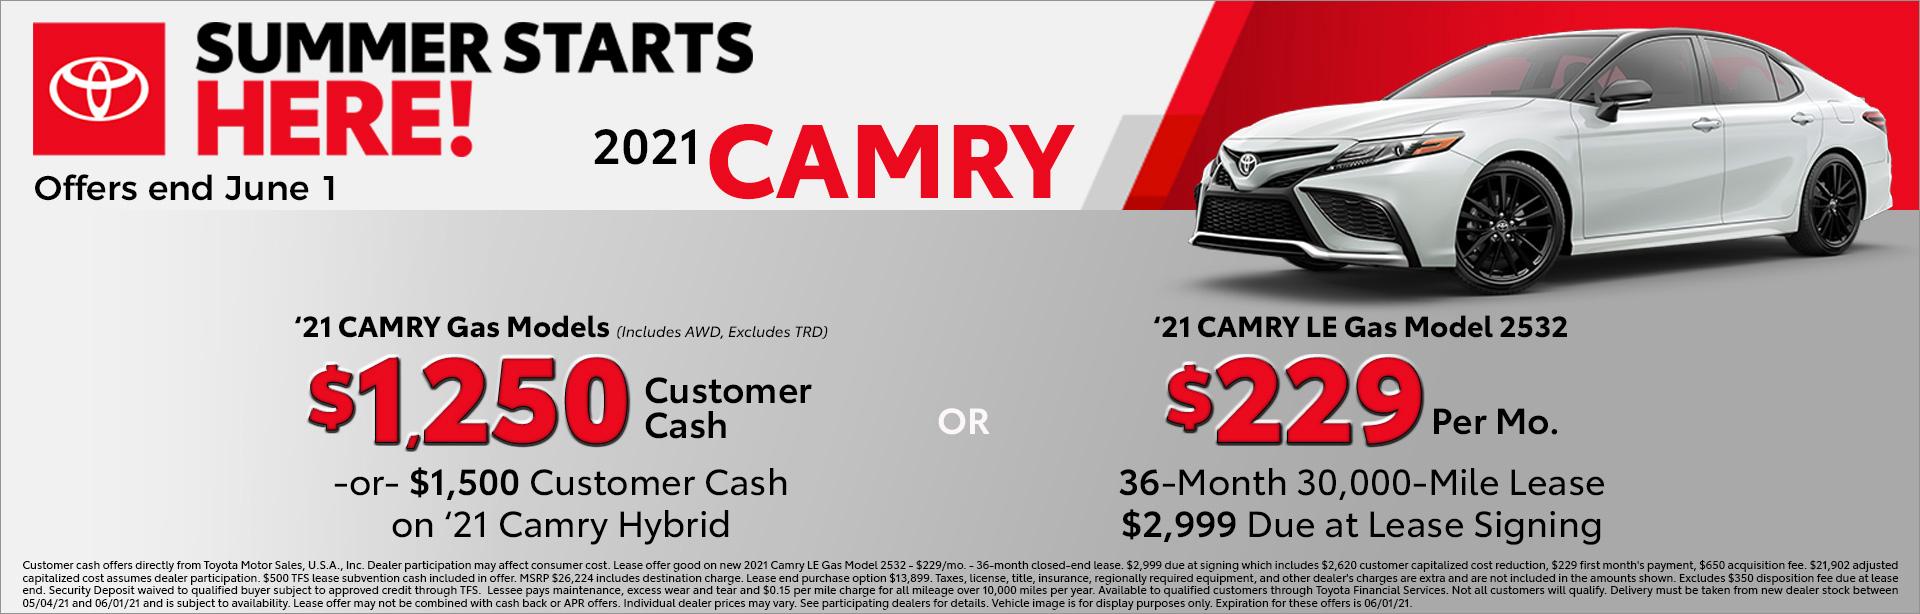 05-21_01_Cincinnati-May-2021-CIN-Summer-Starts-Here-Camry_1920x614_6f3d_Camry-Camry-Hybrid_O_xta.jpeg